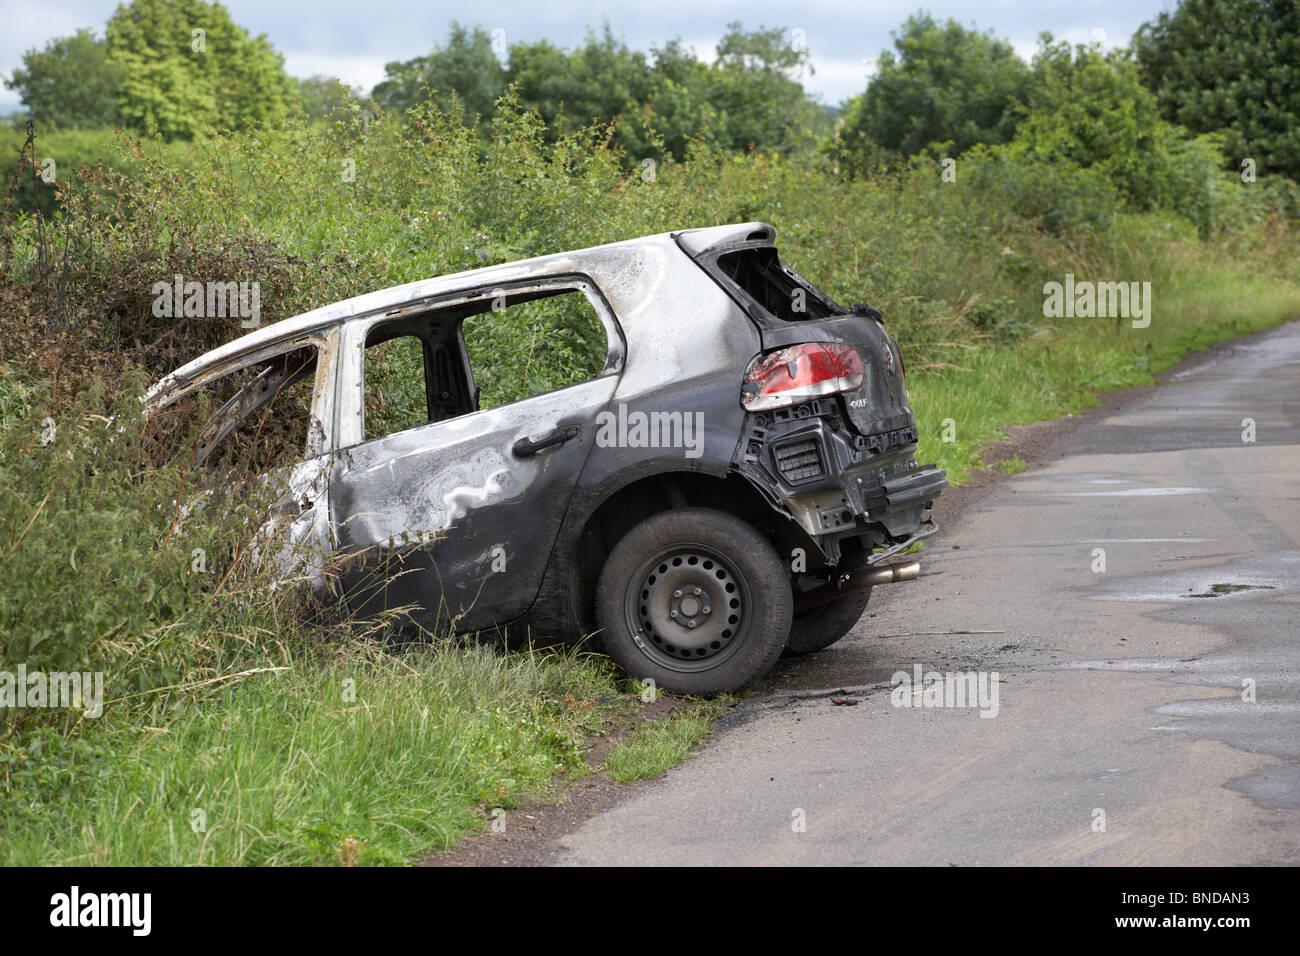 Stolen Car Accident Insurance